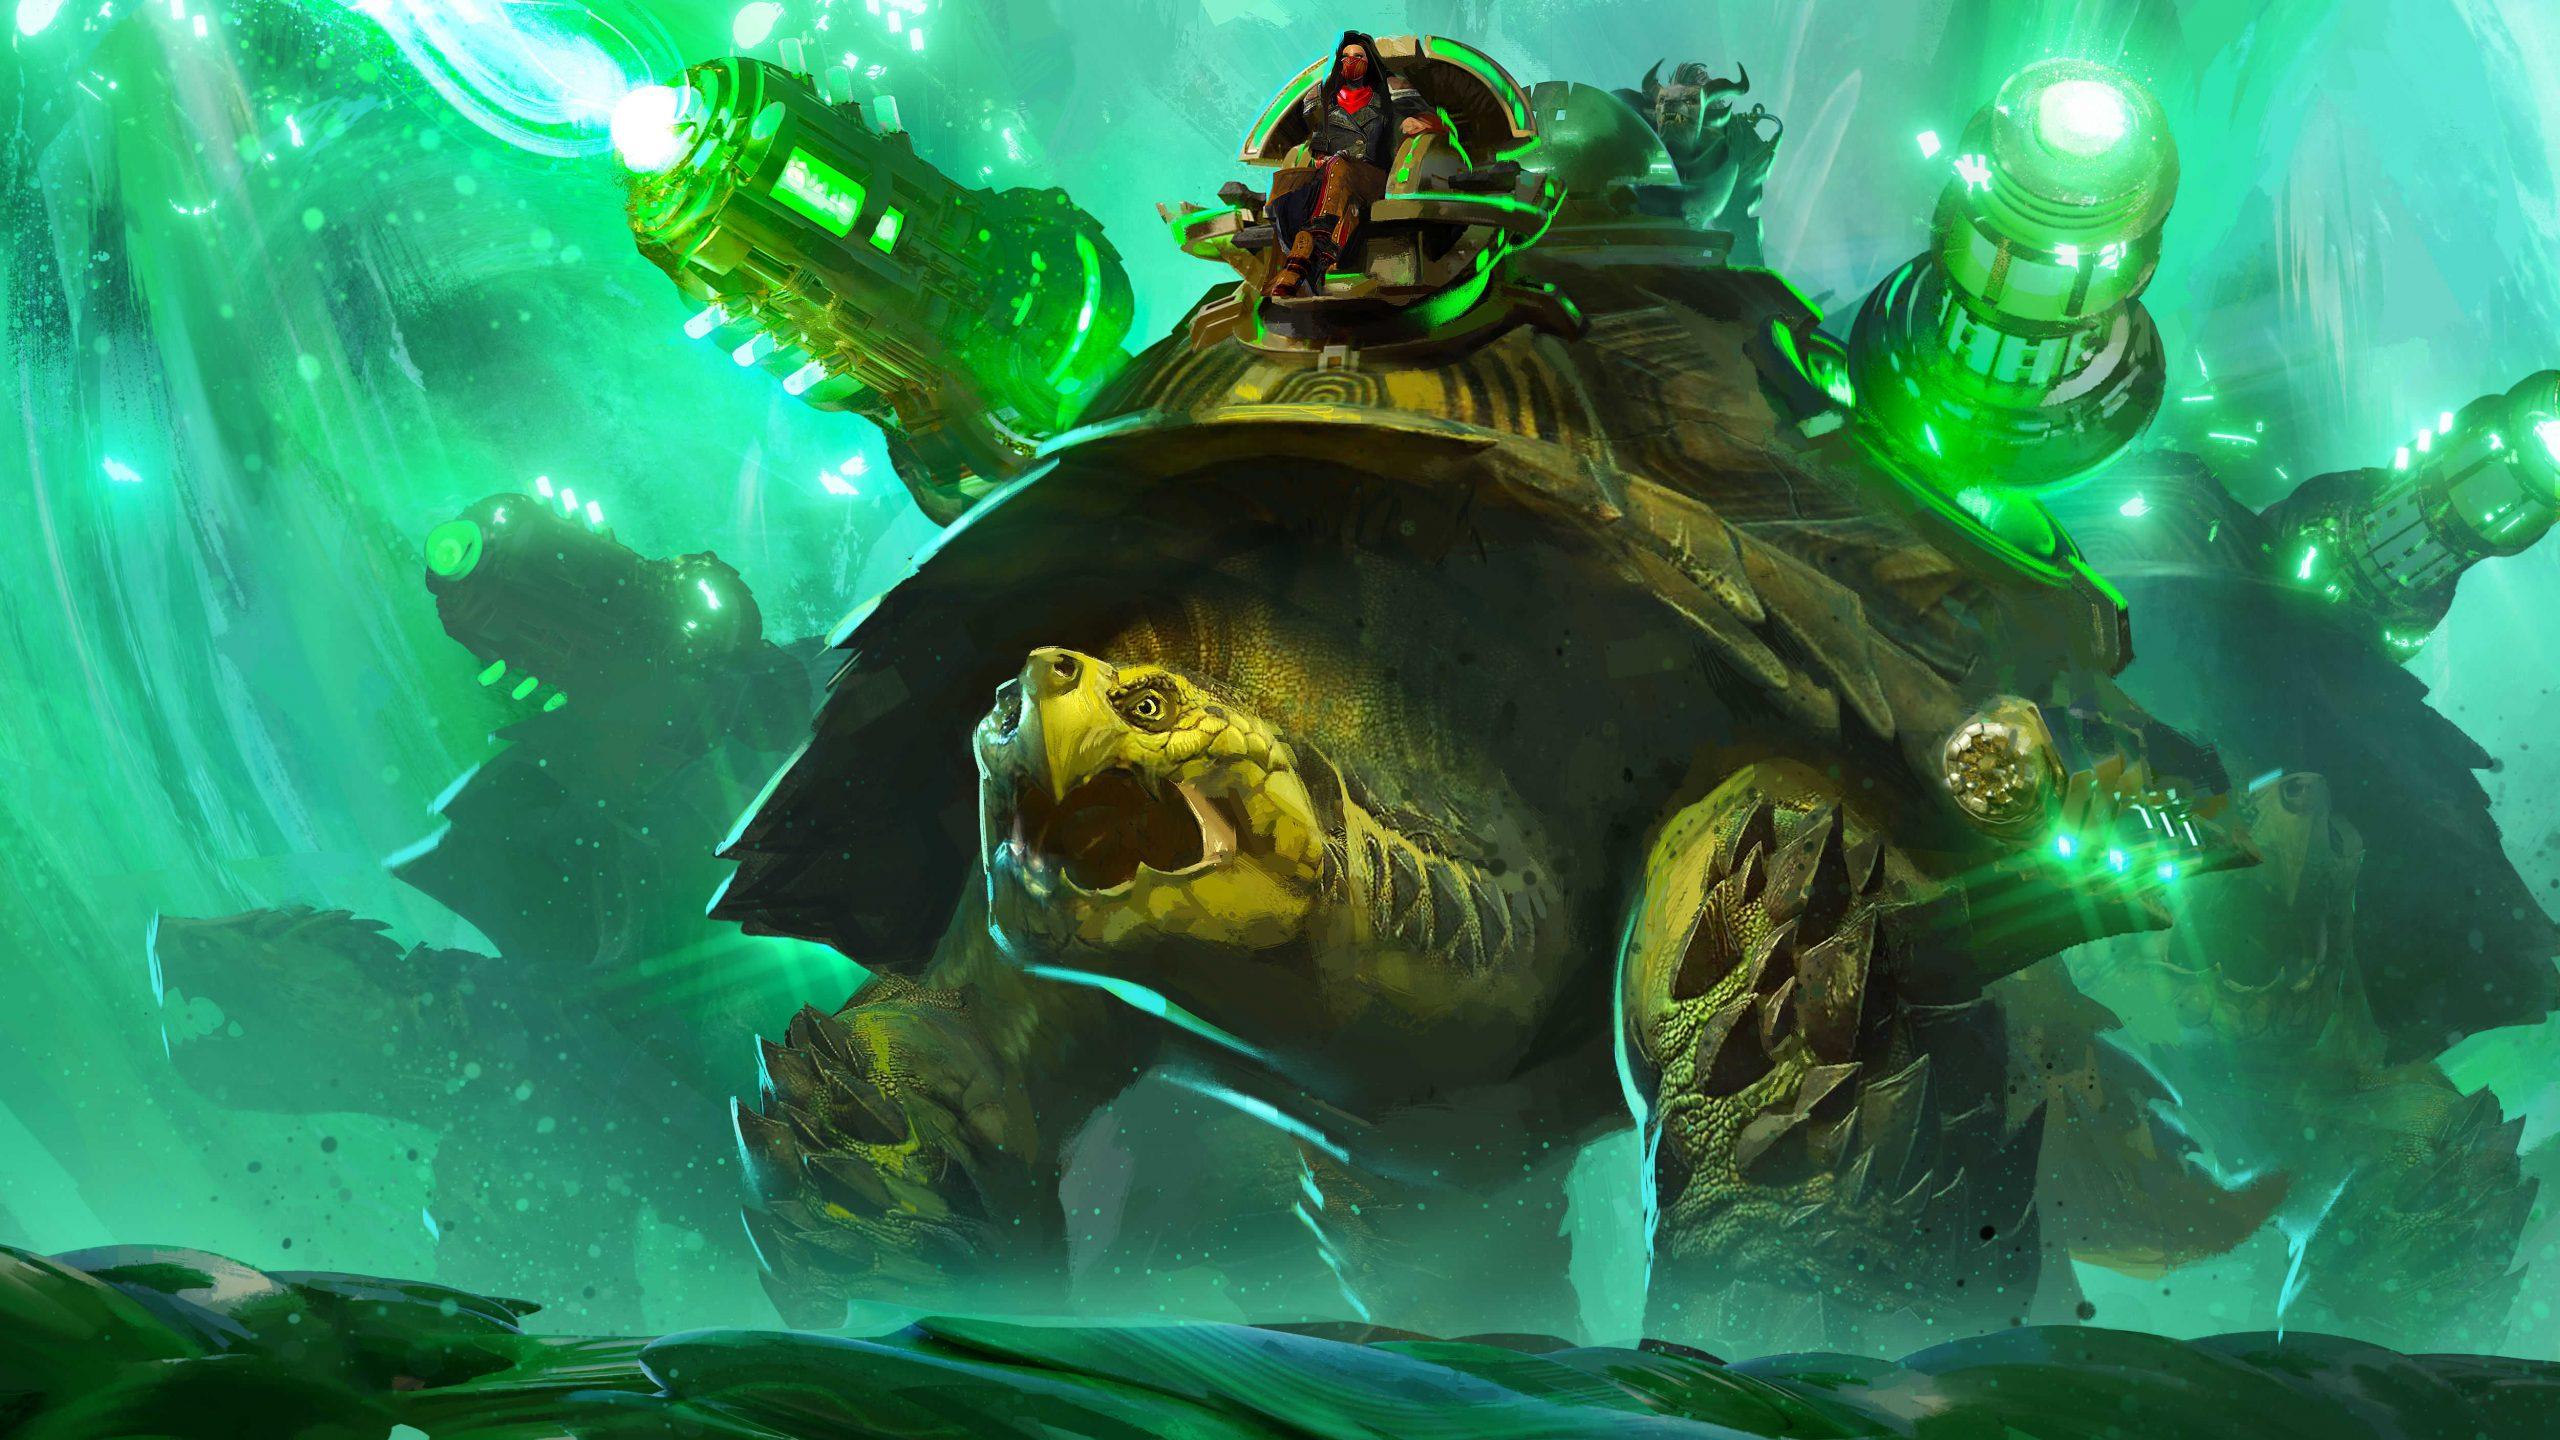 Guild Wars 2 end of dragons GW2 end of dragons GW2 EOD Siege Turtle mount co-op